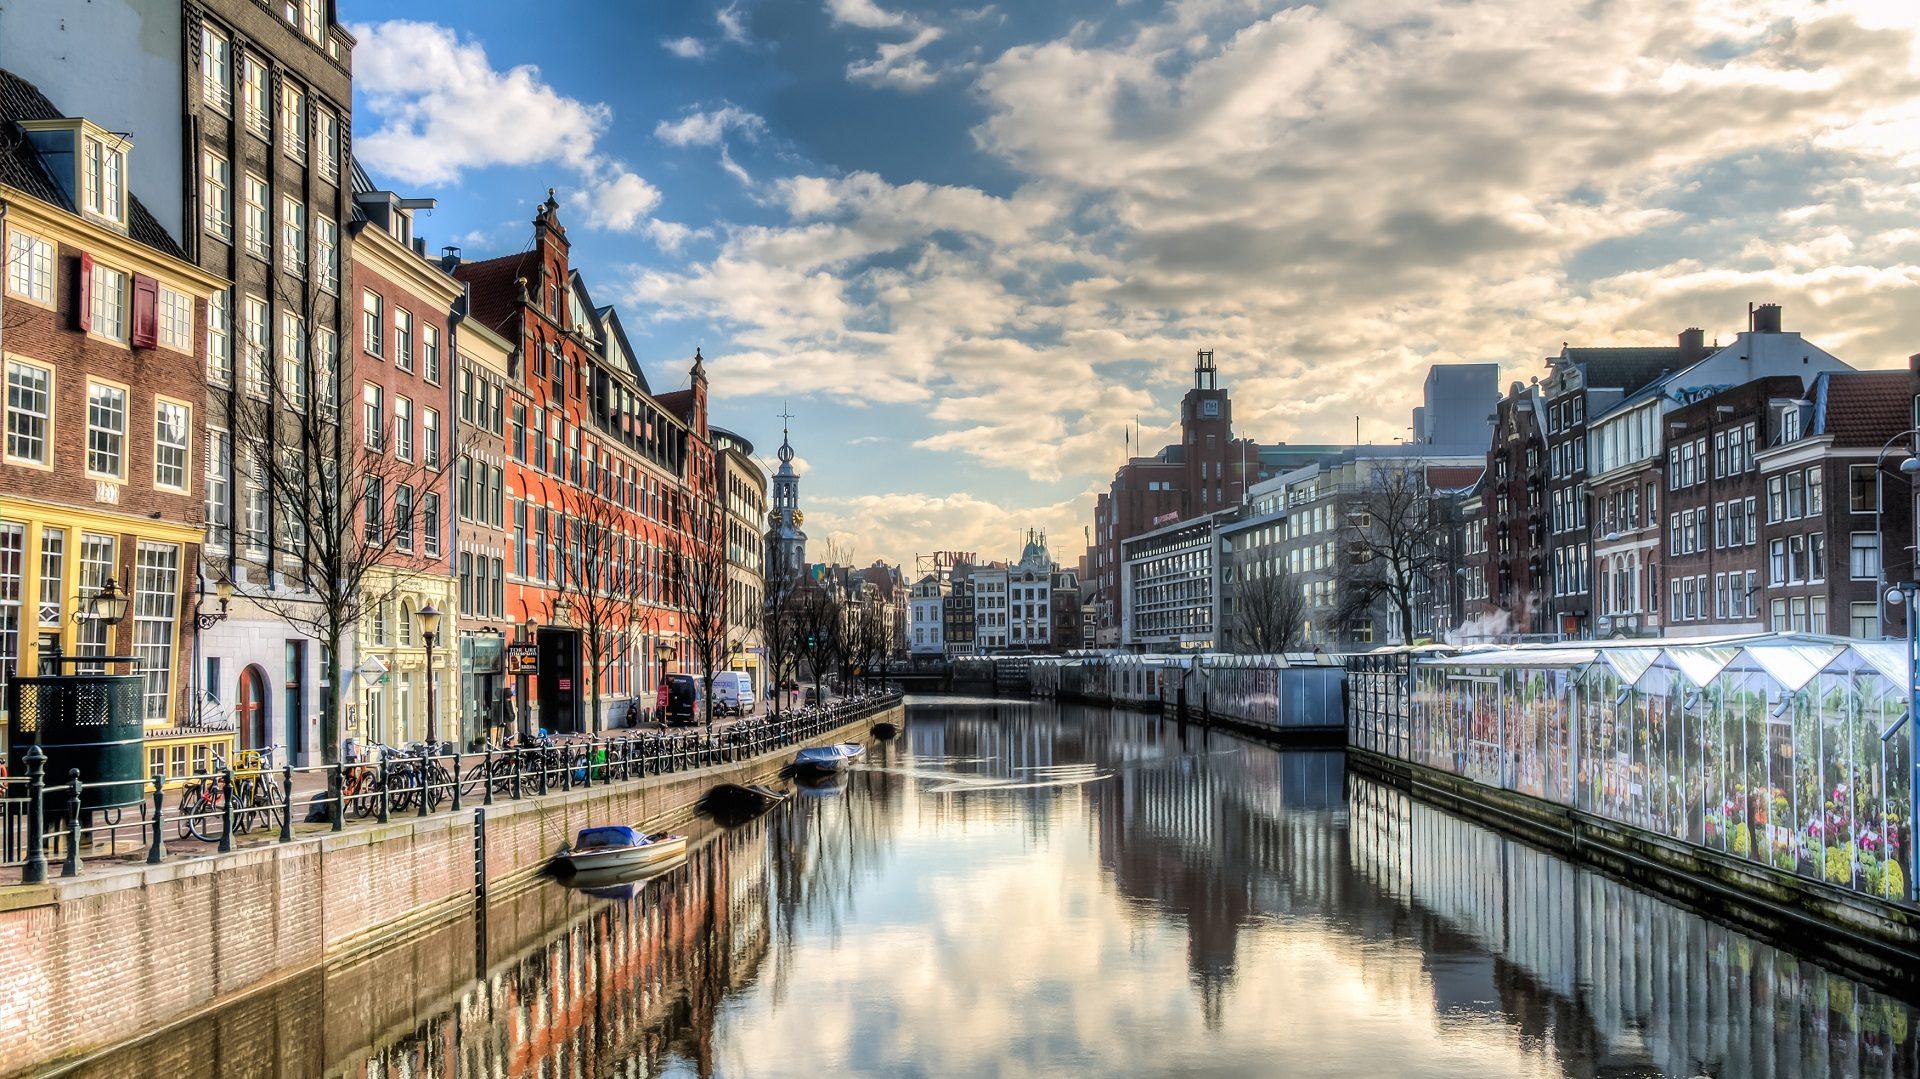 Huizentekoop.nu – Zuid-Holland